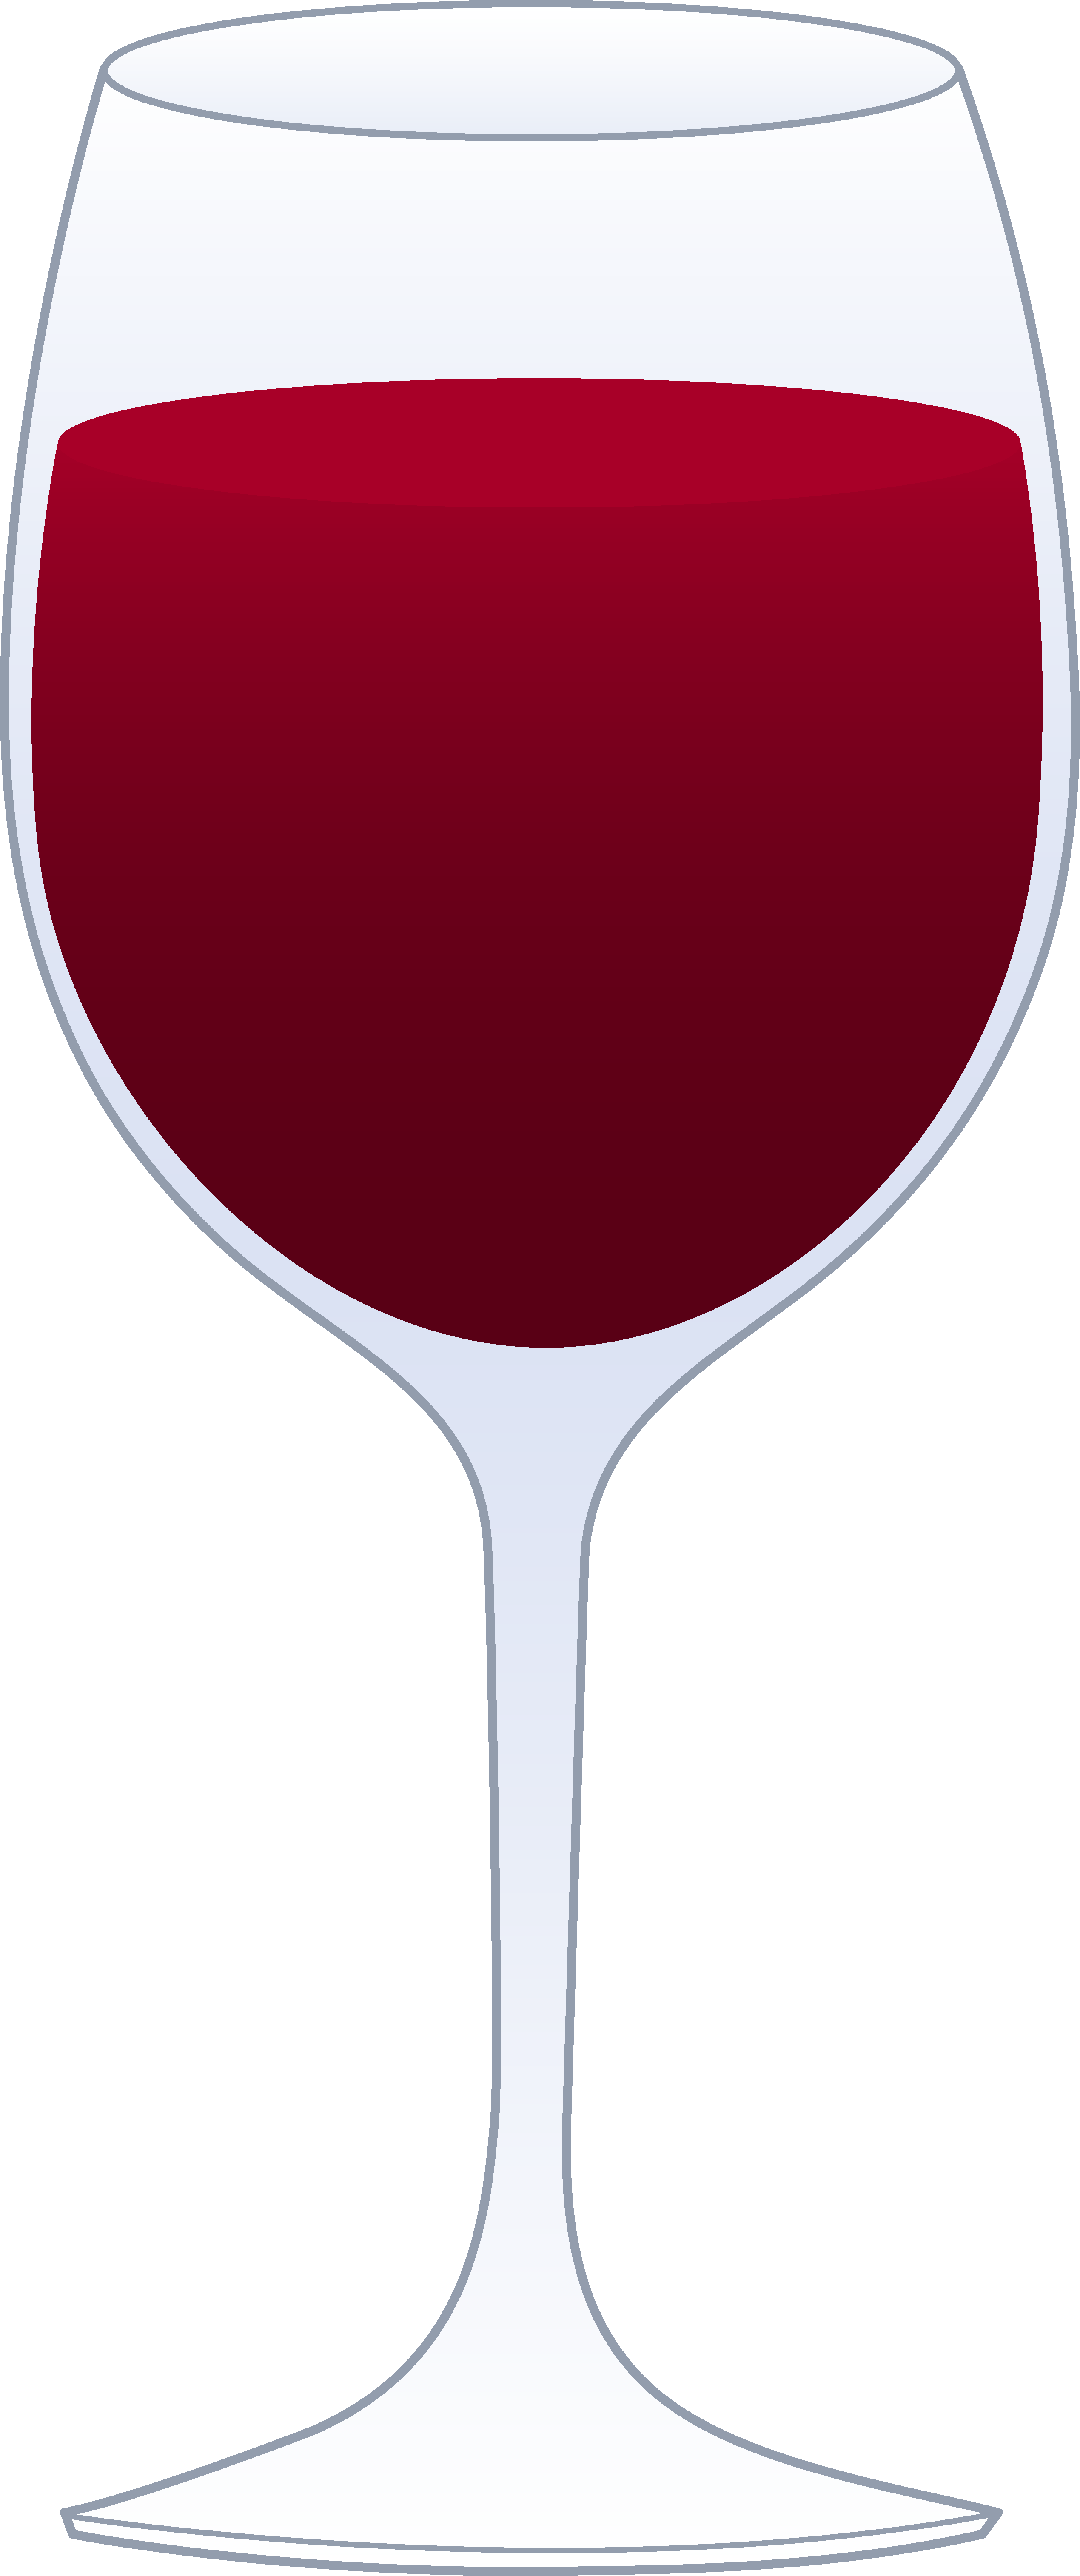 Free Wine Clip Art Image-Free Wine Clip Art Image-4